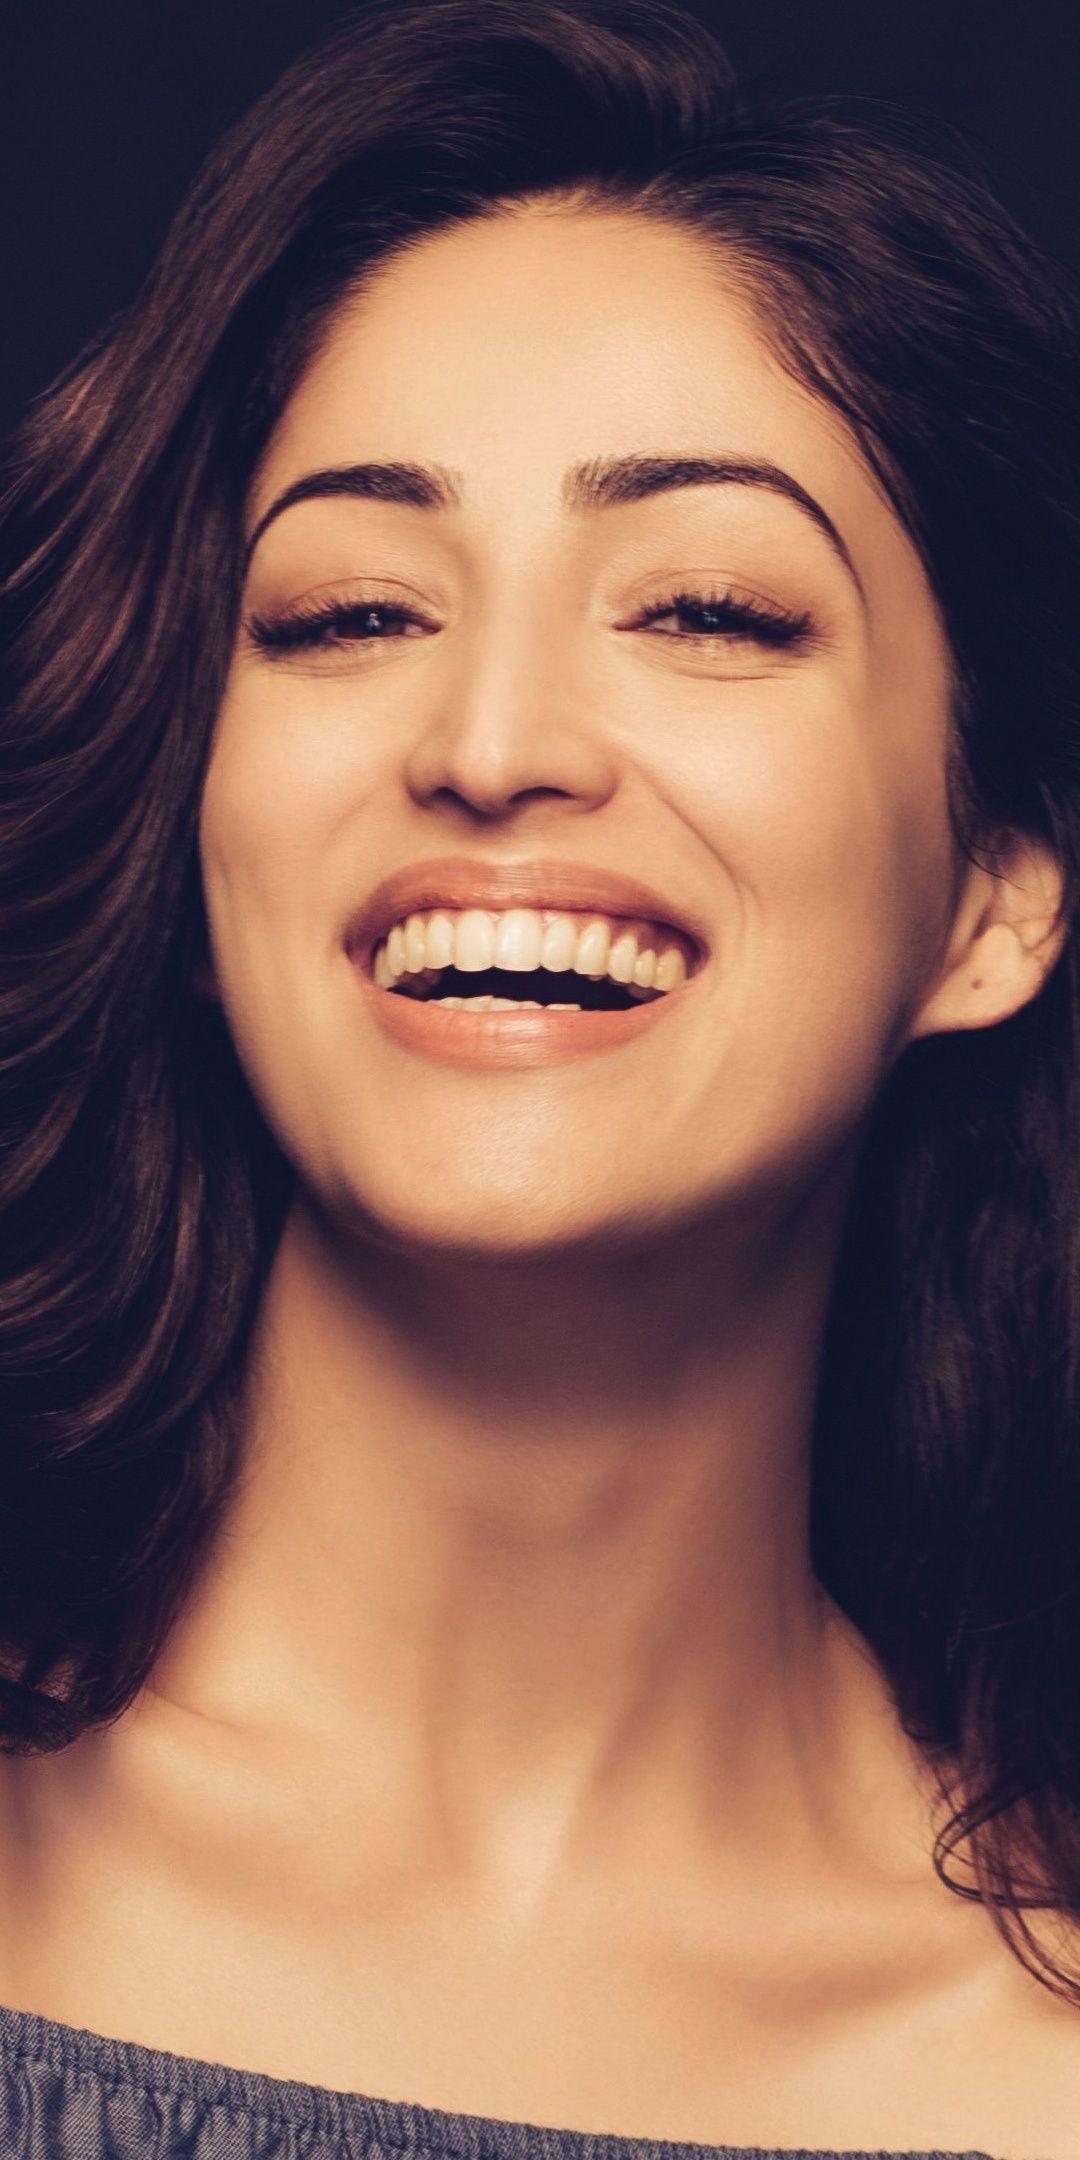 Yami Gautam Actress Bollywood Smile 1080x2160 Wallpaper